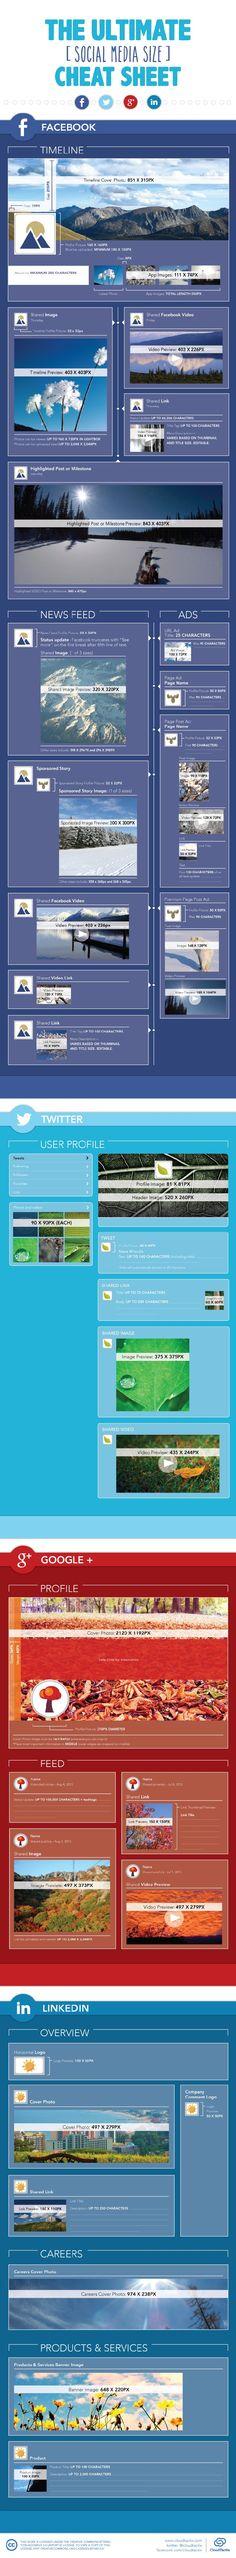 Social media image sizes for Facebook, Twitter, LinkedIn, Google+  and YouTube